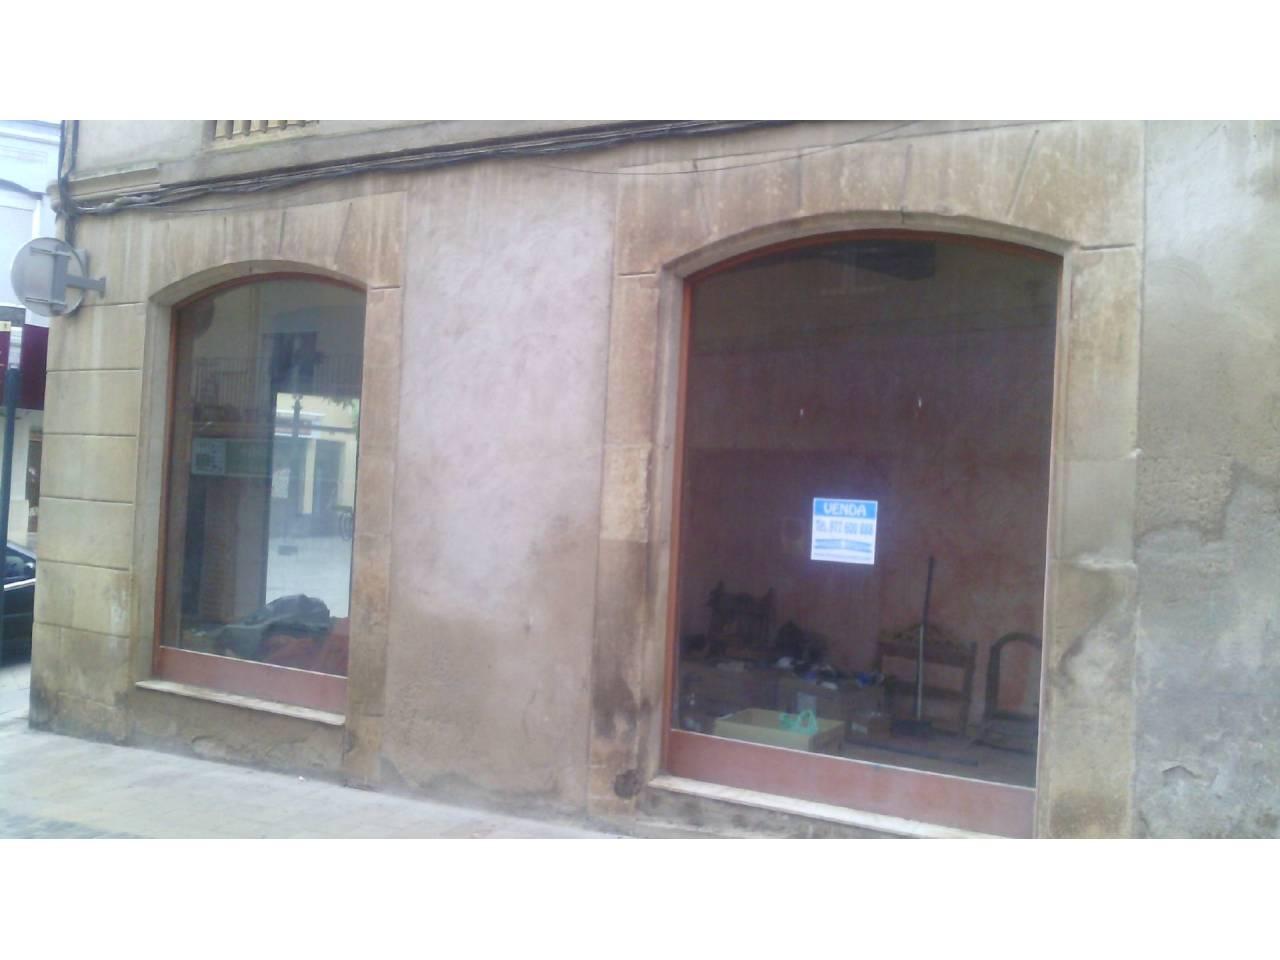 Business premise  Calle abadia. Superf. 60 m²,  1 aseo, calefacción, agua, luz, aire acondiciona